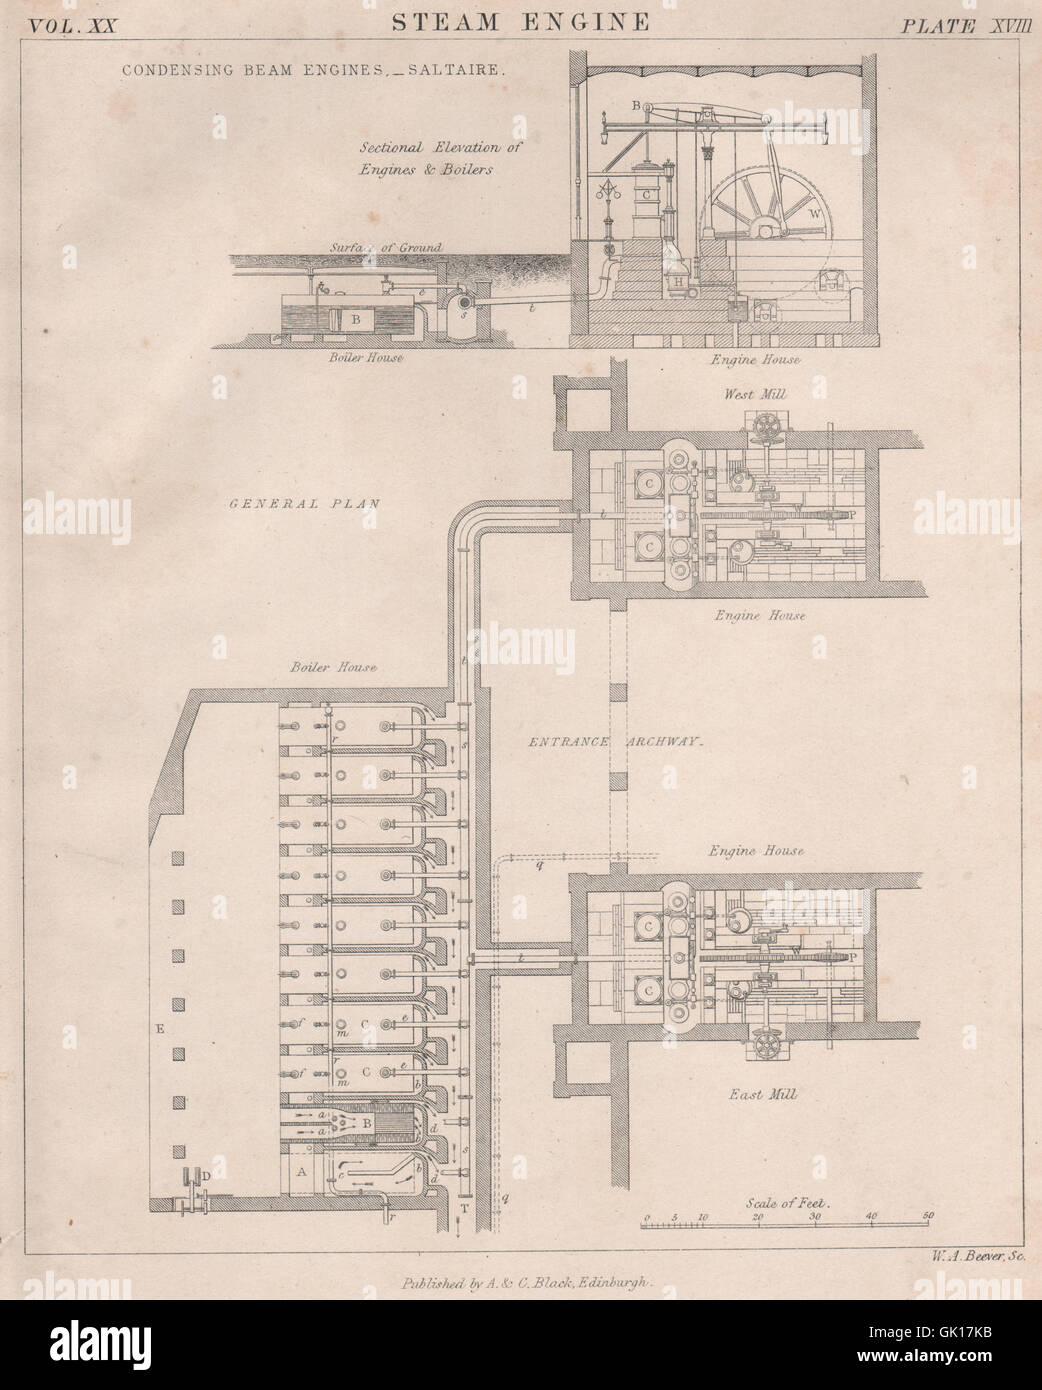 VICTORIAN ENGINEERING DRAWING Condensing Beam Steam Engines – Diagram Of Condensing Steam Engine